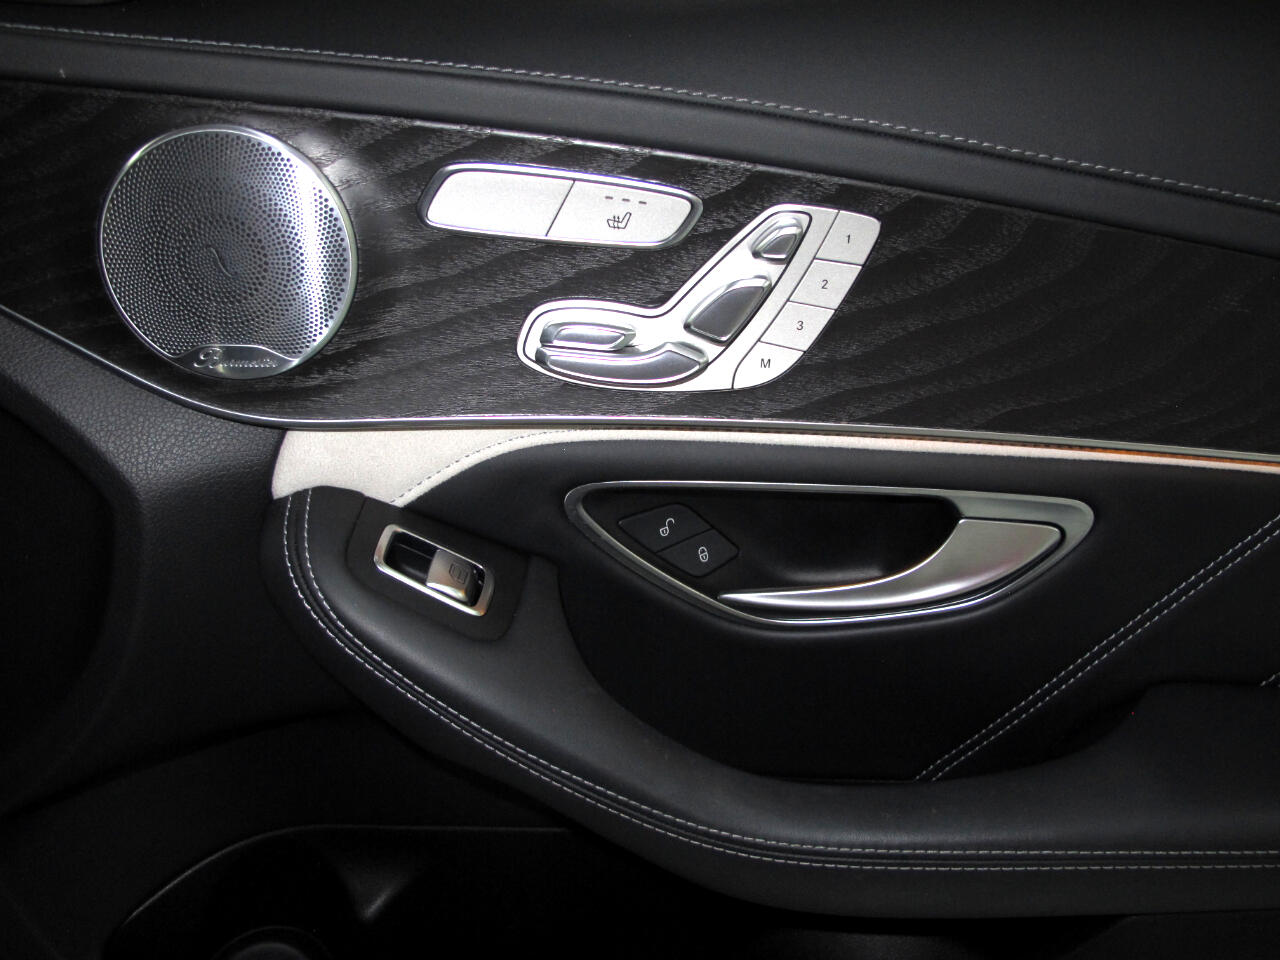 2016 Mercedes-Benz C-Class 4dr Sdn AMG C 63 S RWD